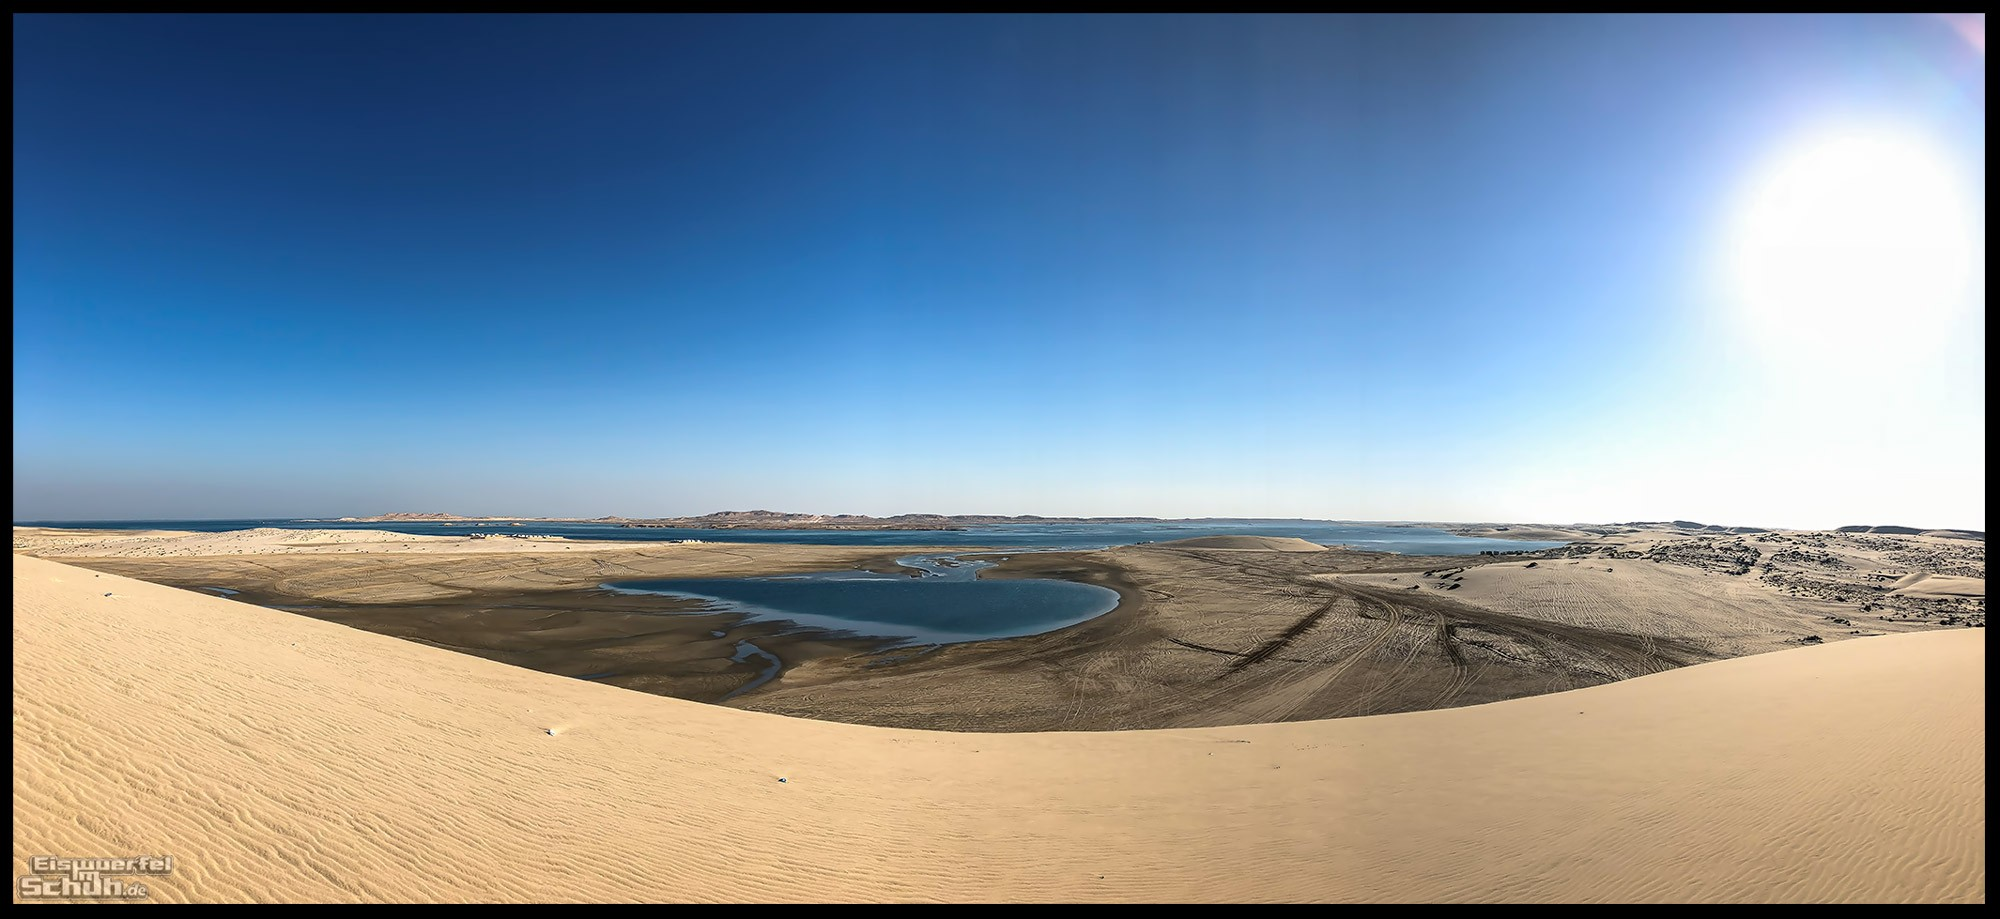 Inland Sea - Binnenmeer NaturreservatKhor Al-Adaid in Katar